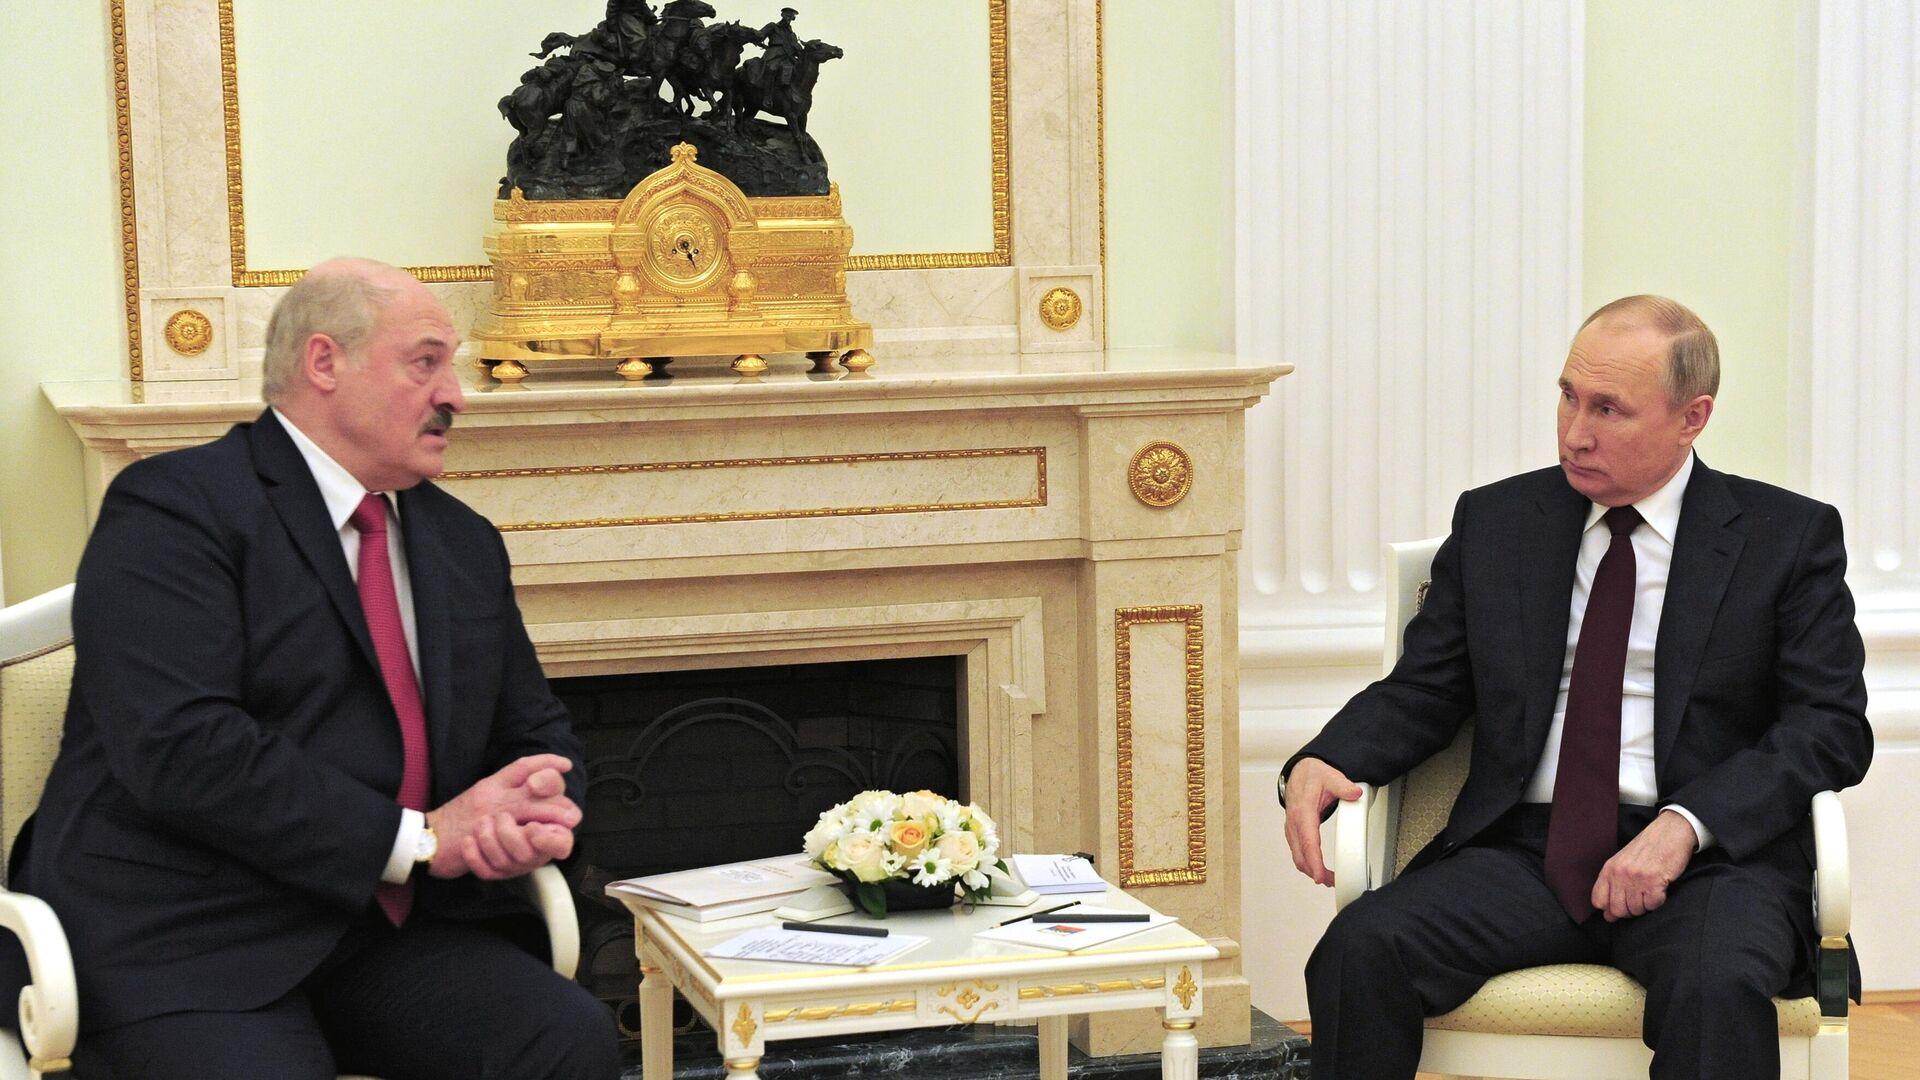 Президент РФ Владимир Путин и президент Белоруссии Александр Лукашенко во время встречи - РИА Новости, 1920, 02.07.2021